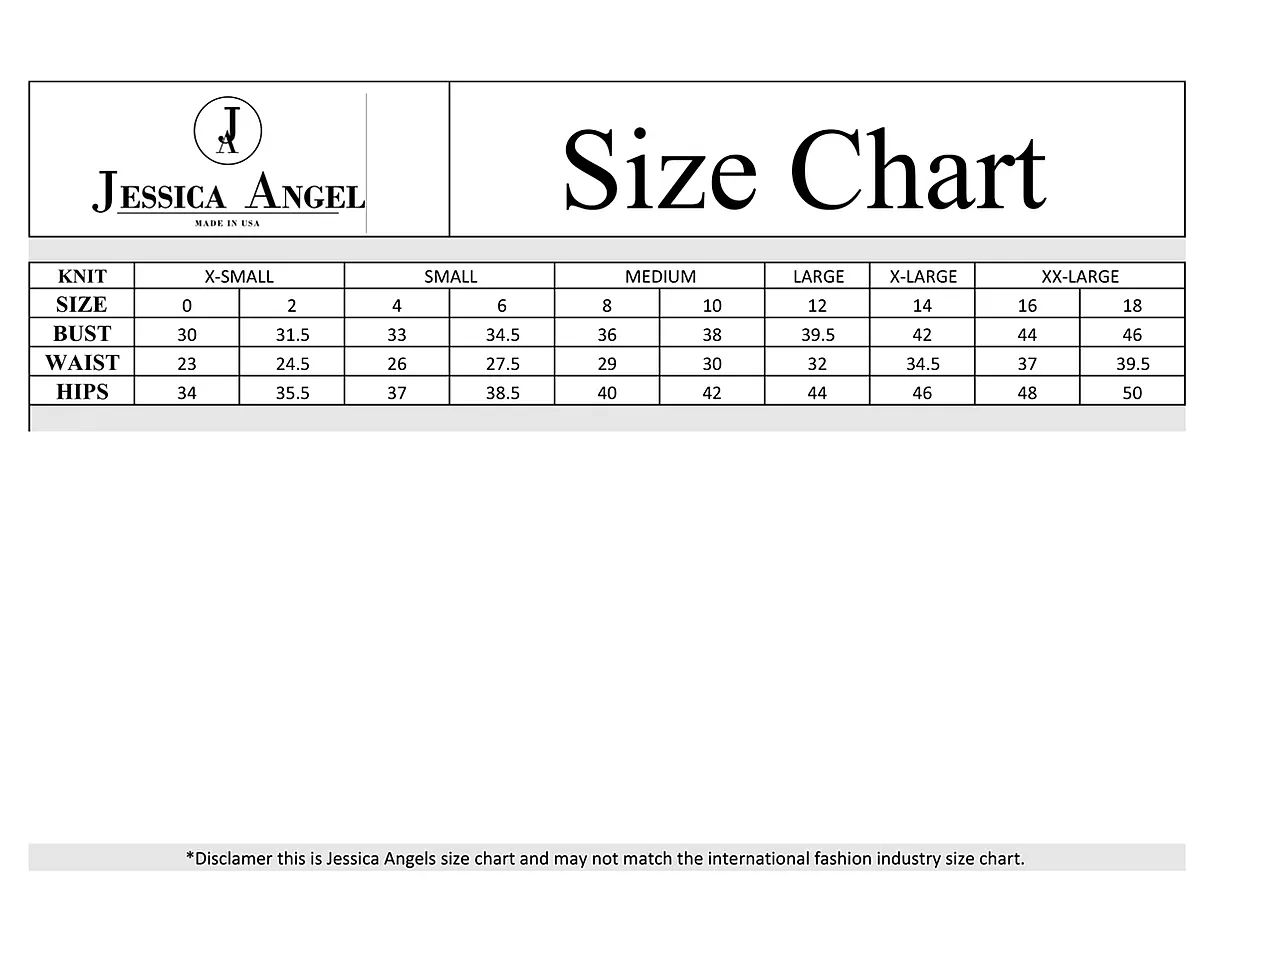 jessica-angel-size-chart-hd.png